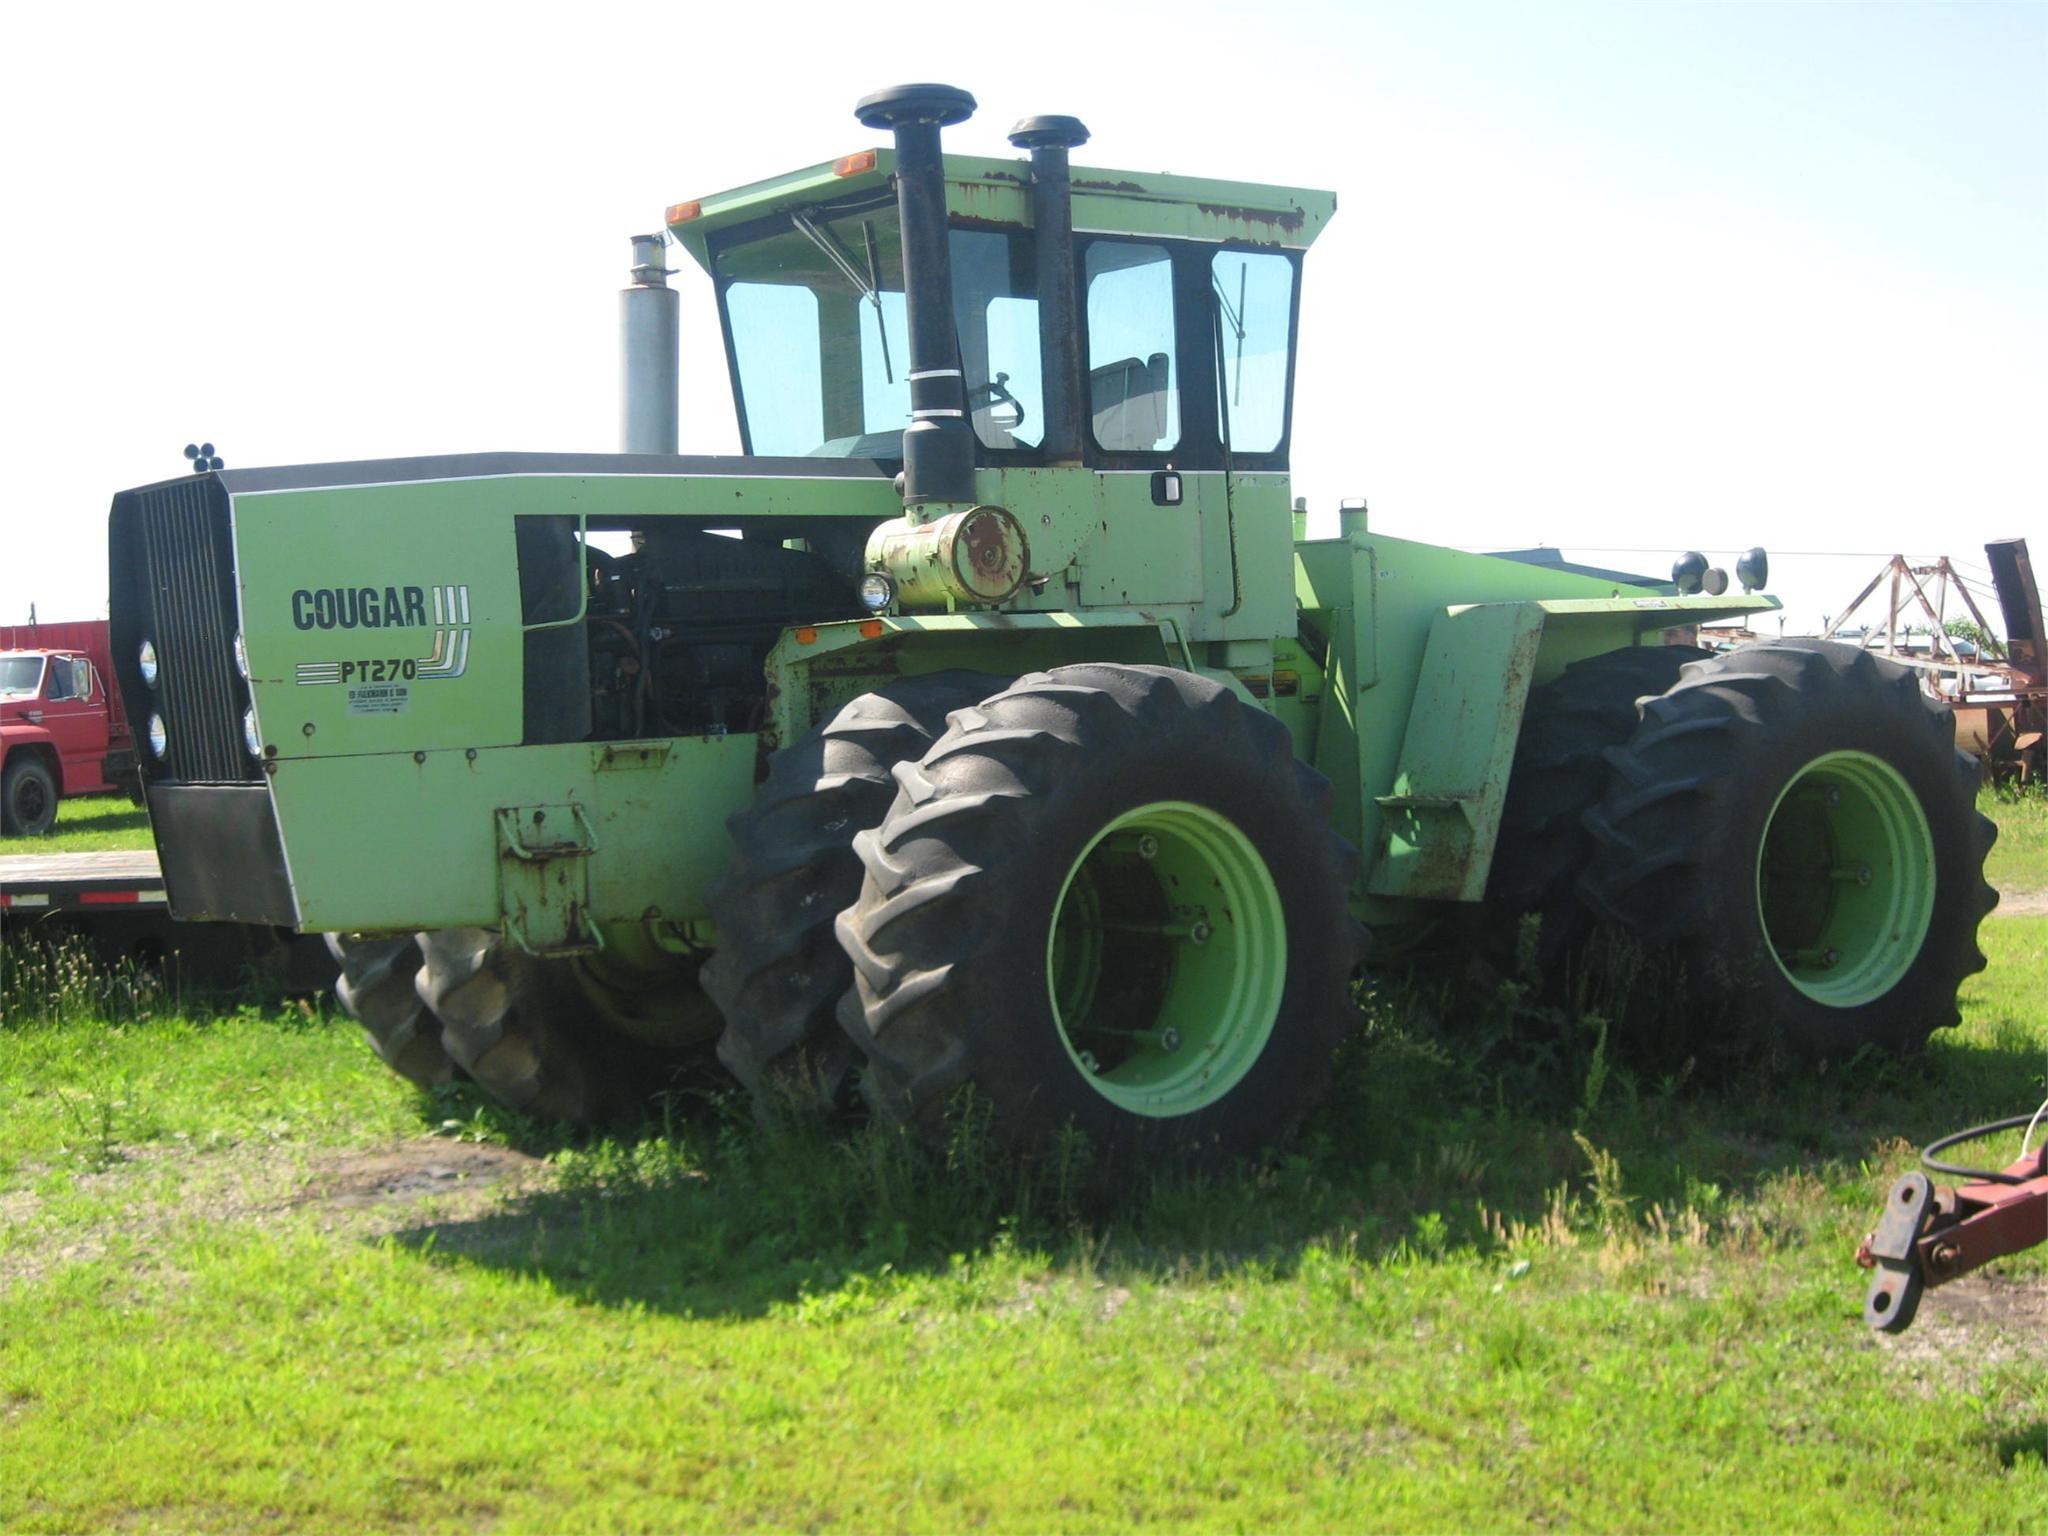 1981 Steiger Cougar III PT270 Tractor